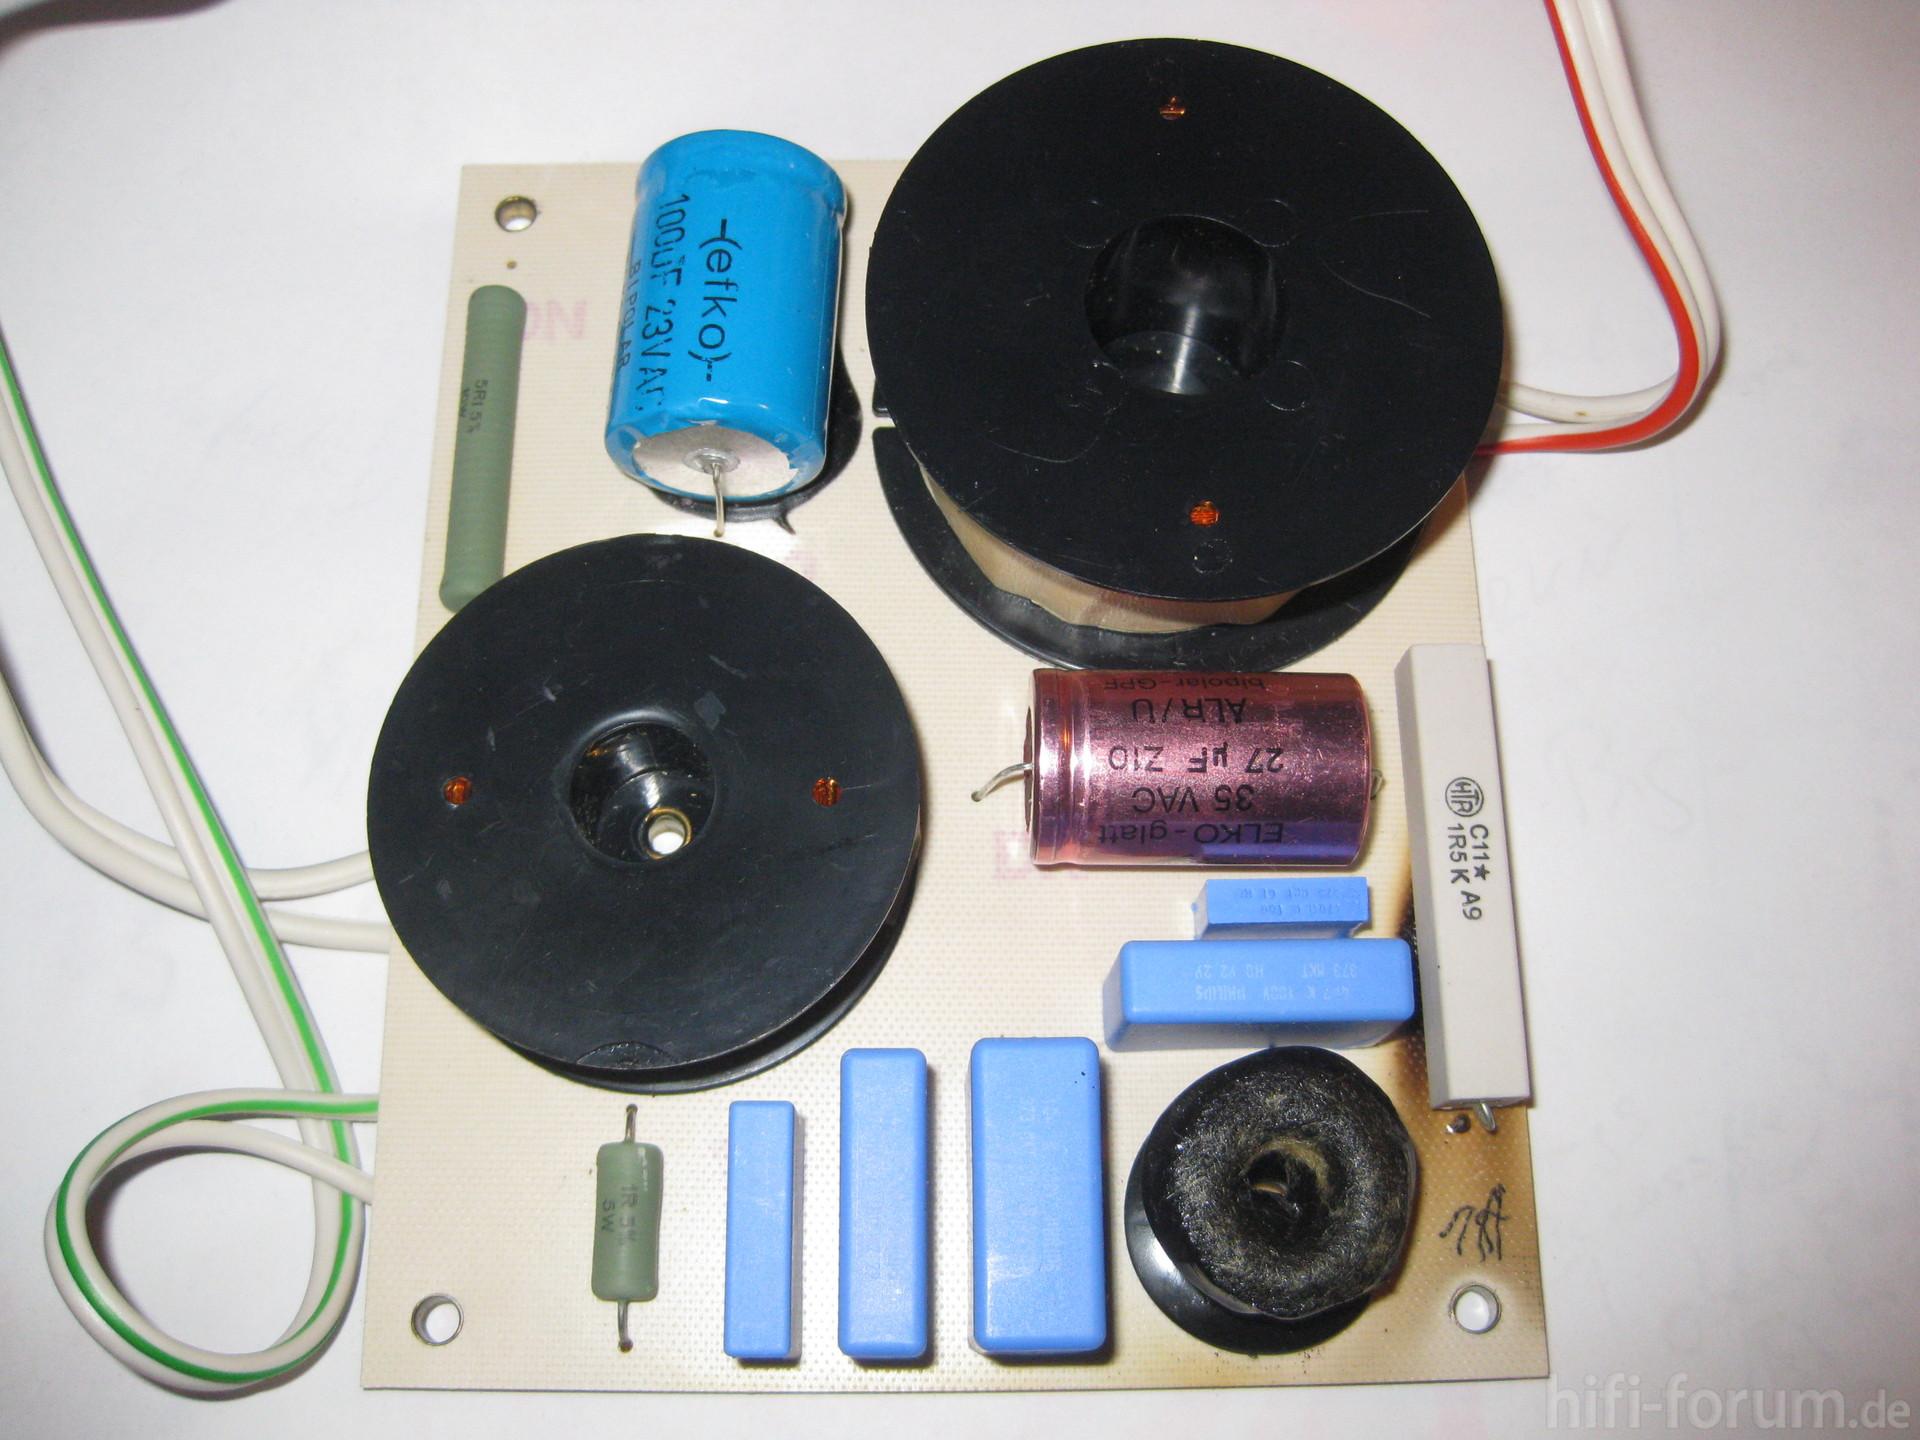 frequenzweiche teufel m200 frequenzweiche m200 spule teufel hifi bildergalerie. Black Bedroom Furniture Sets. Home Design Ideas